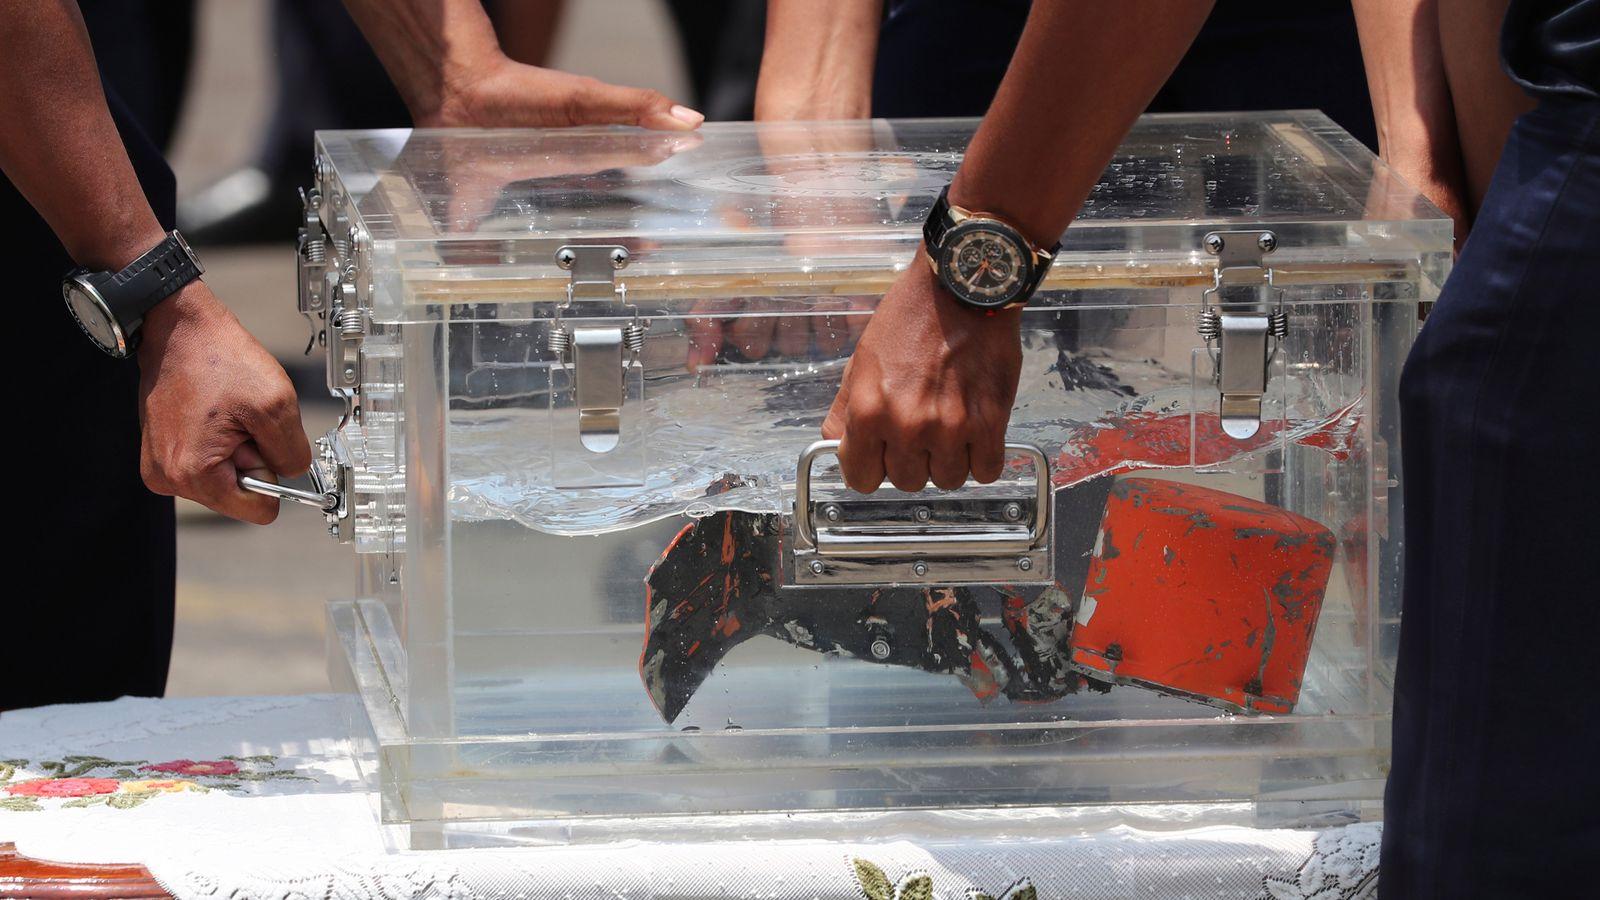 Indonesia plane crash: Navy divers recover cockpit voice recorder of Sriwijaya Air jet